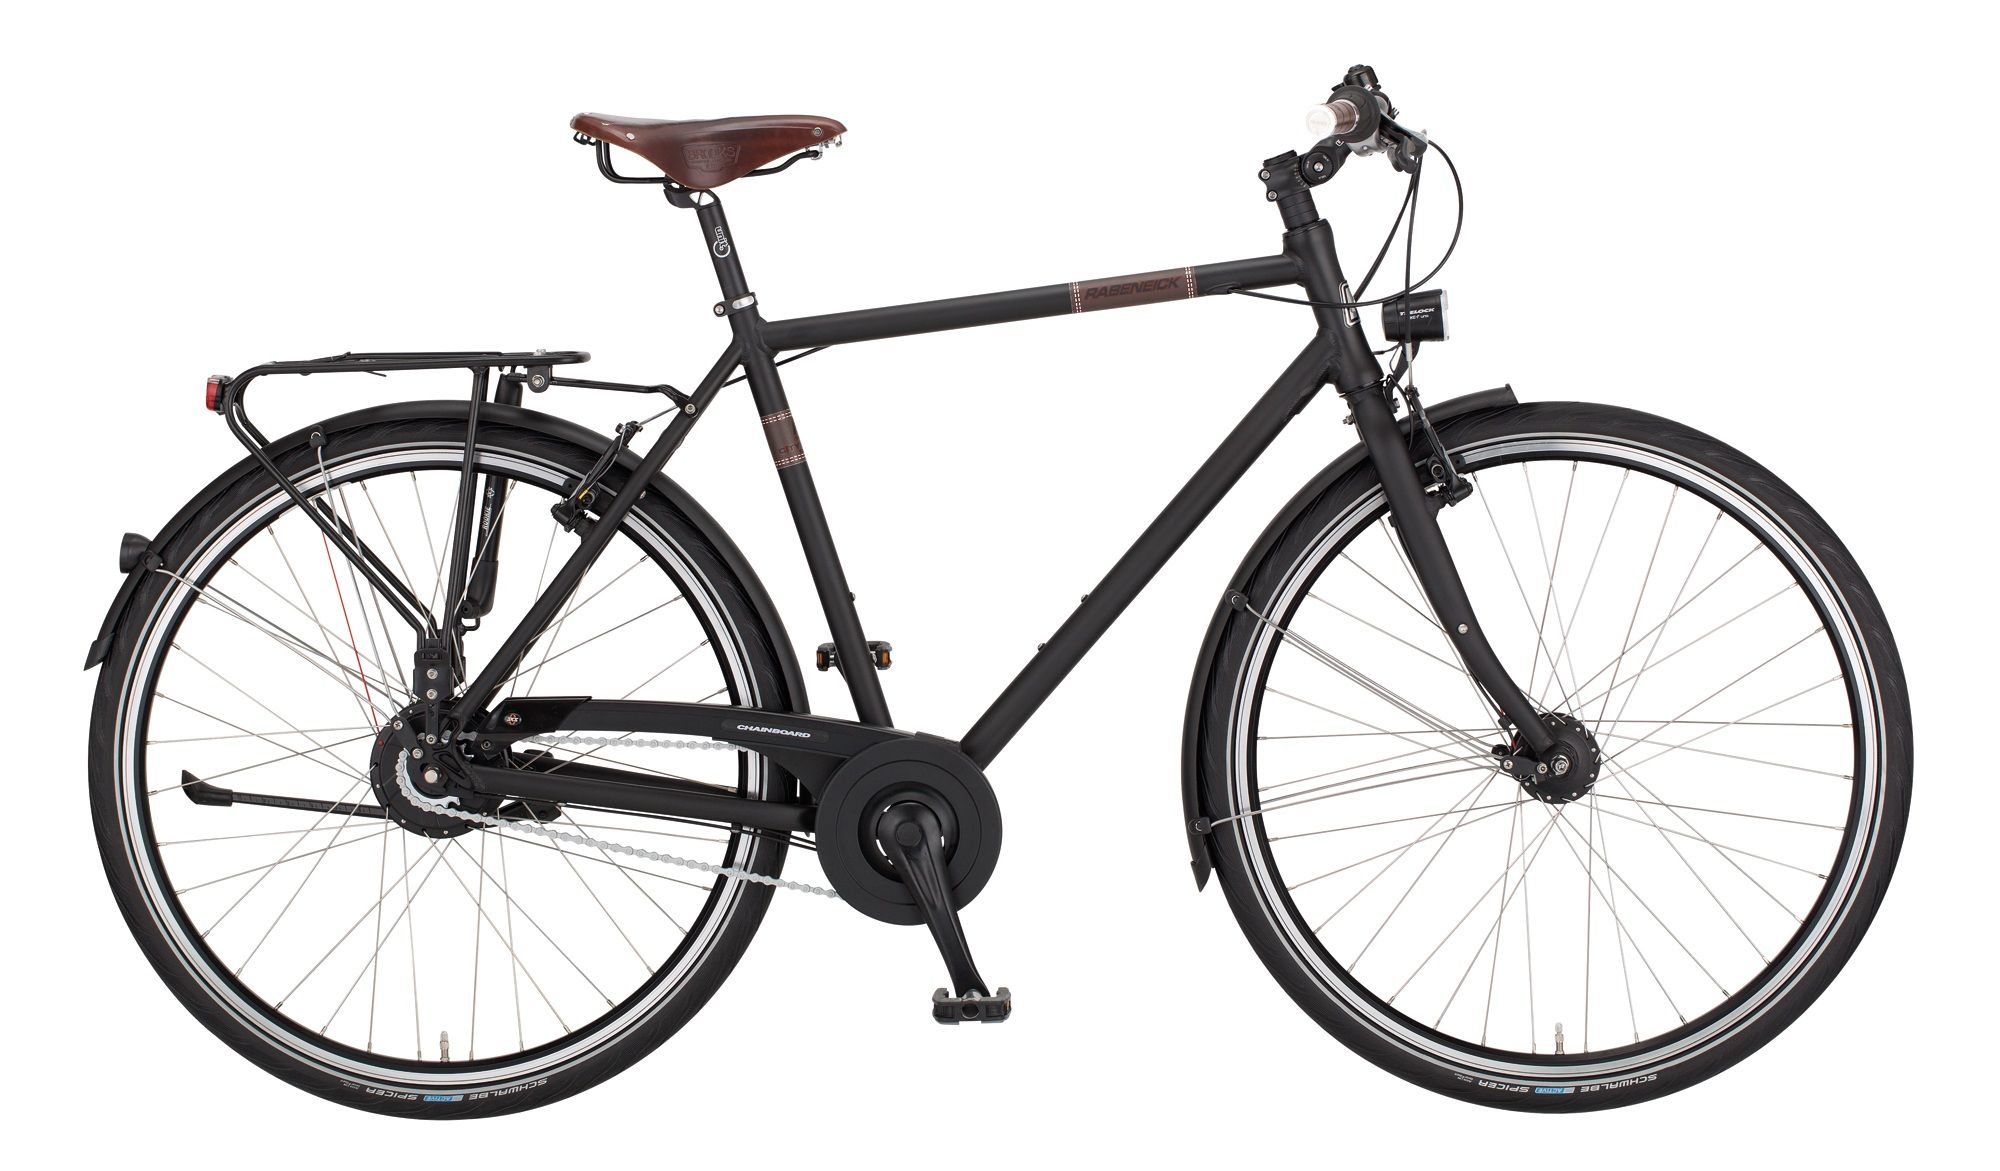 28_Damen_Modern_Anna_taubenblau.jpg (5336×4000) | Retro vélo maken ...